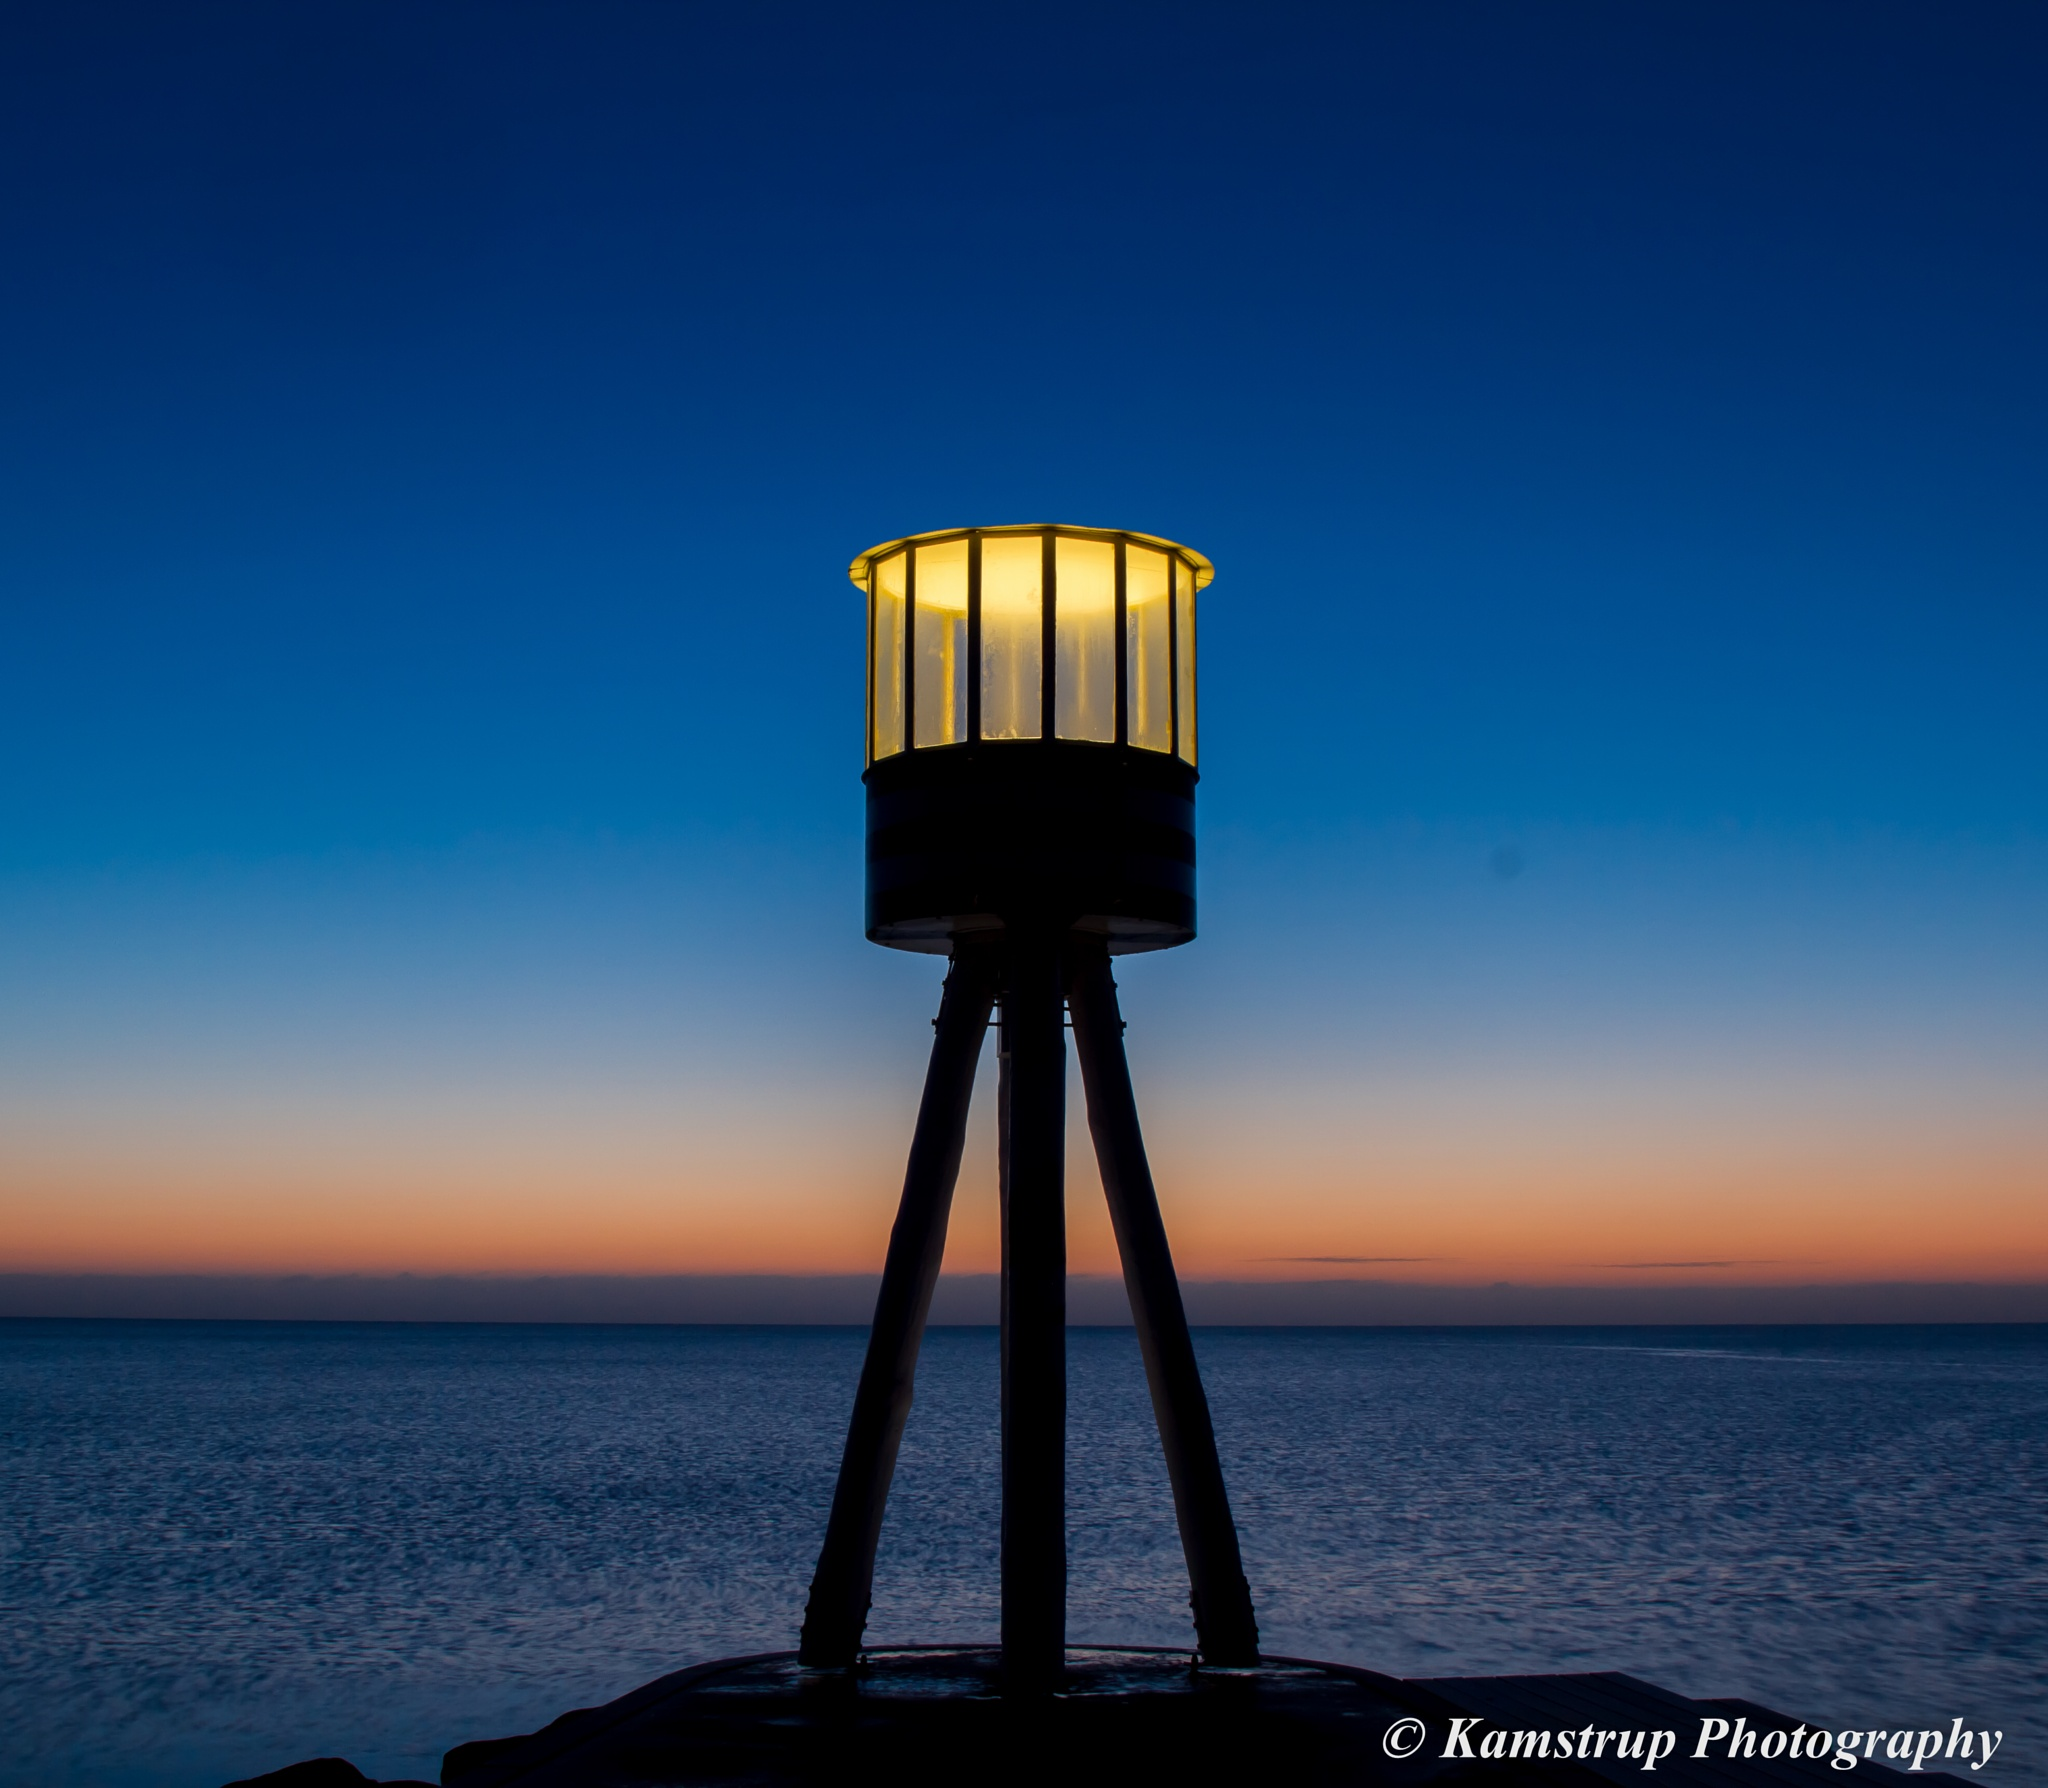 Morning tower by Ole Kamstrup Jakobsen